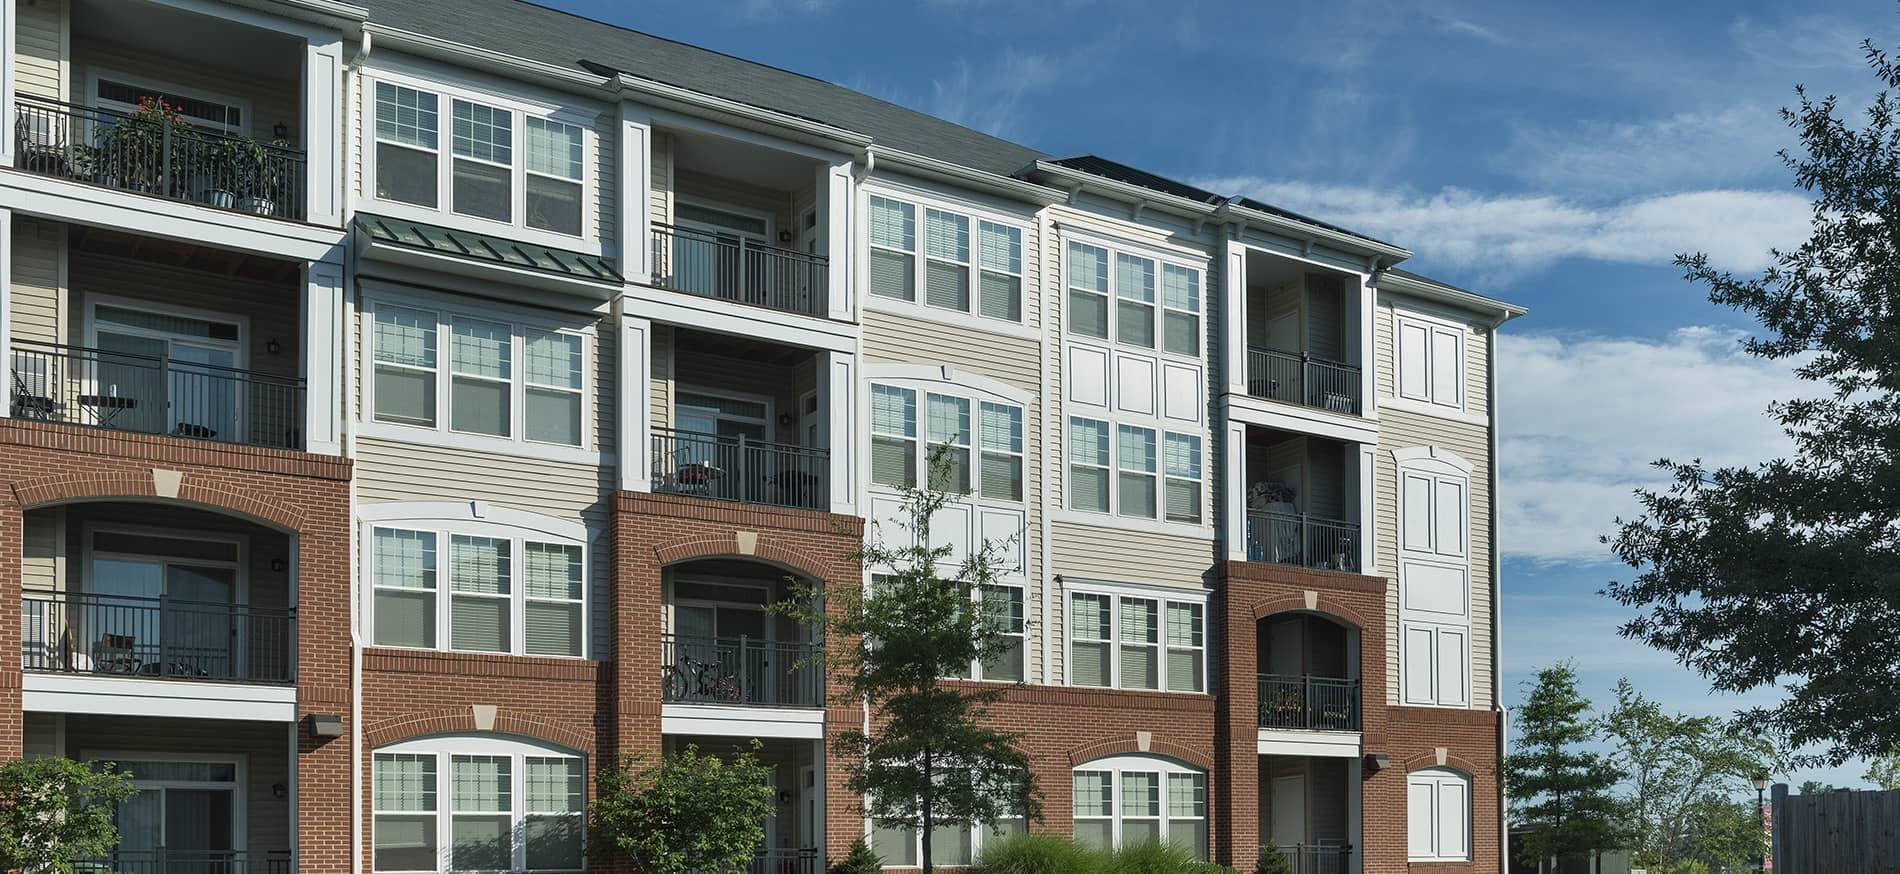 Signal hill apartments in woodbridge va - 2 bedroom apartments in woodbridge va ...